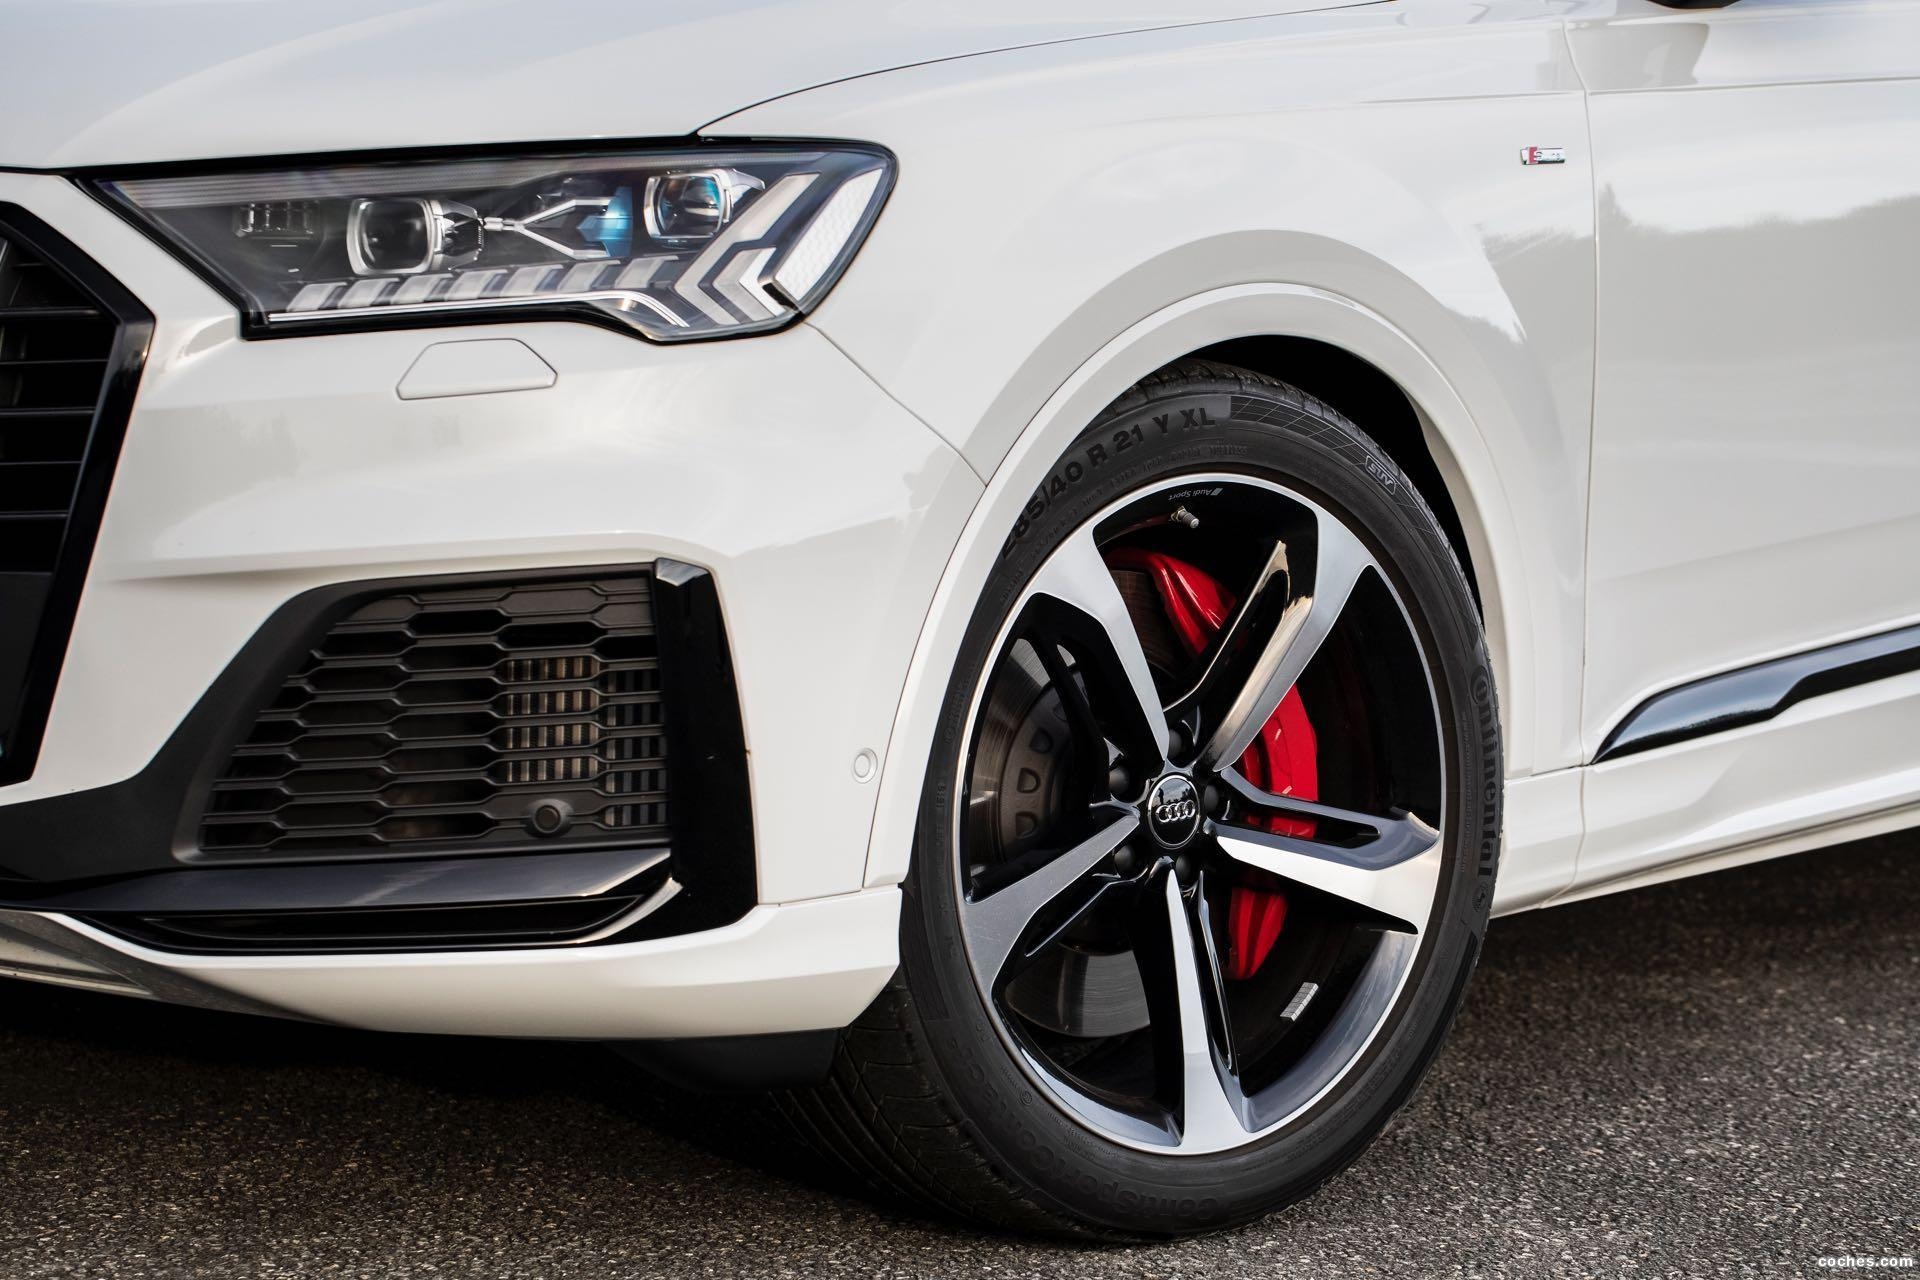 Foto 13 de Audi Q7 60 TFSIe quattro S line 2020